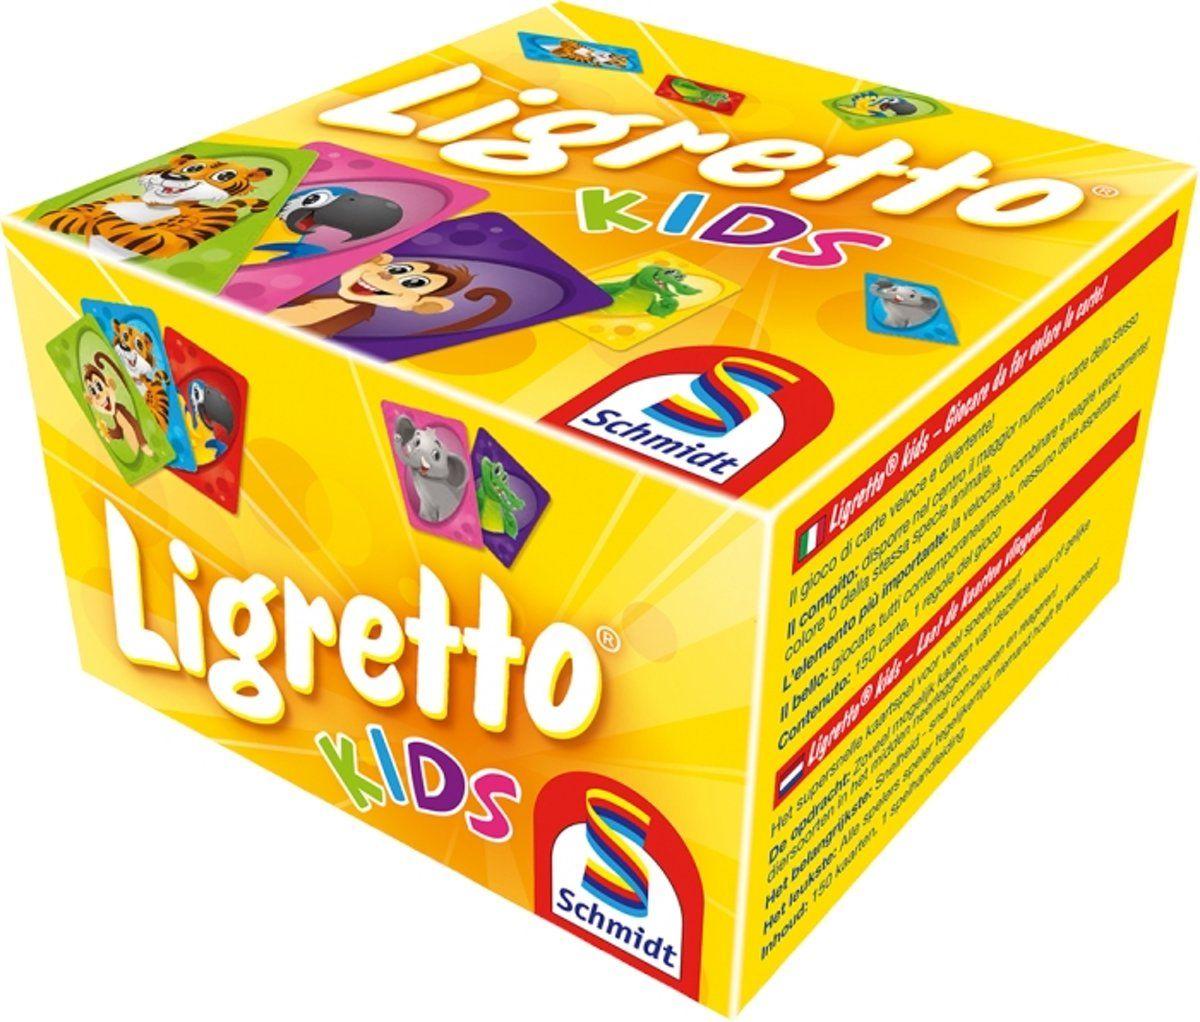 999 games Ligretto kids kaartspel @trekpleister